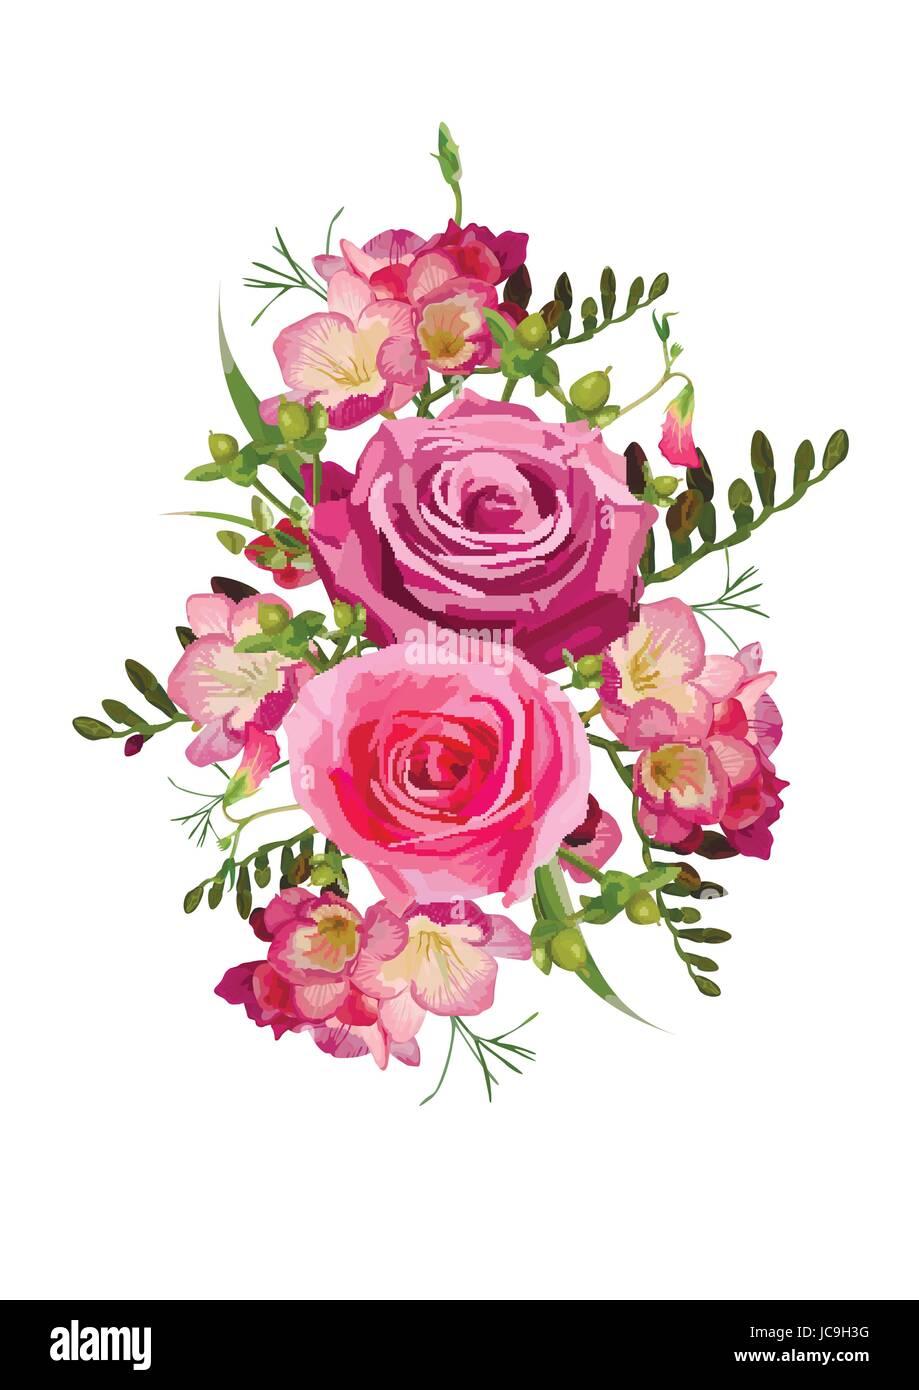 Fleur Rose Rose Freesia Hypericum Pois Herbes Feuilles Belle Belle